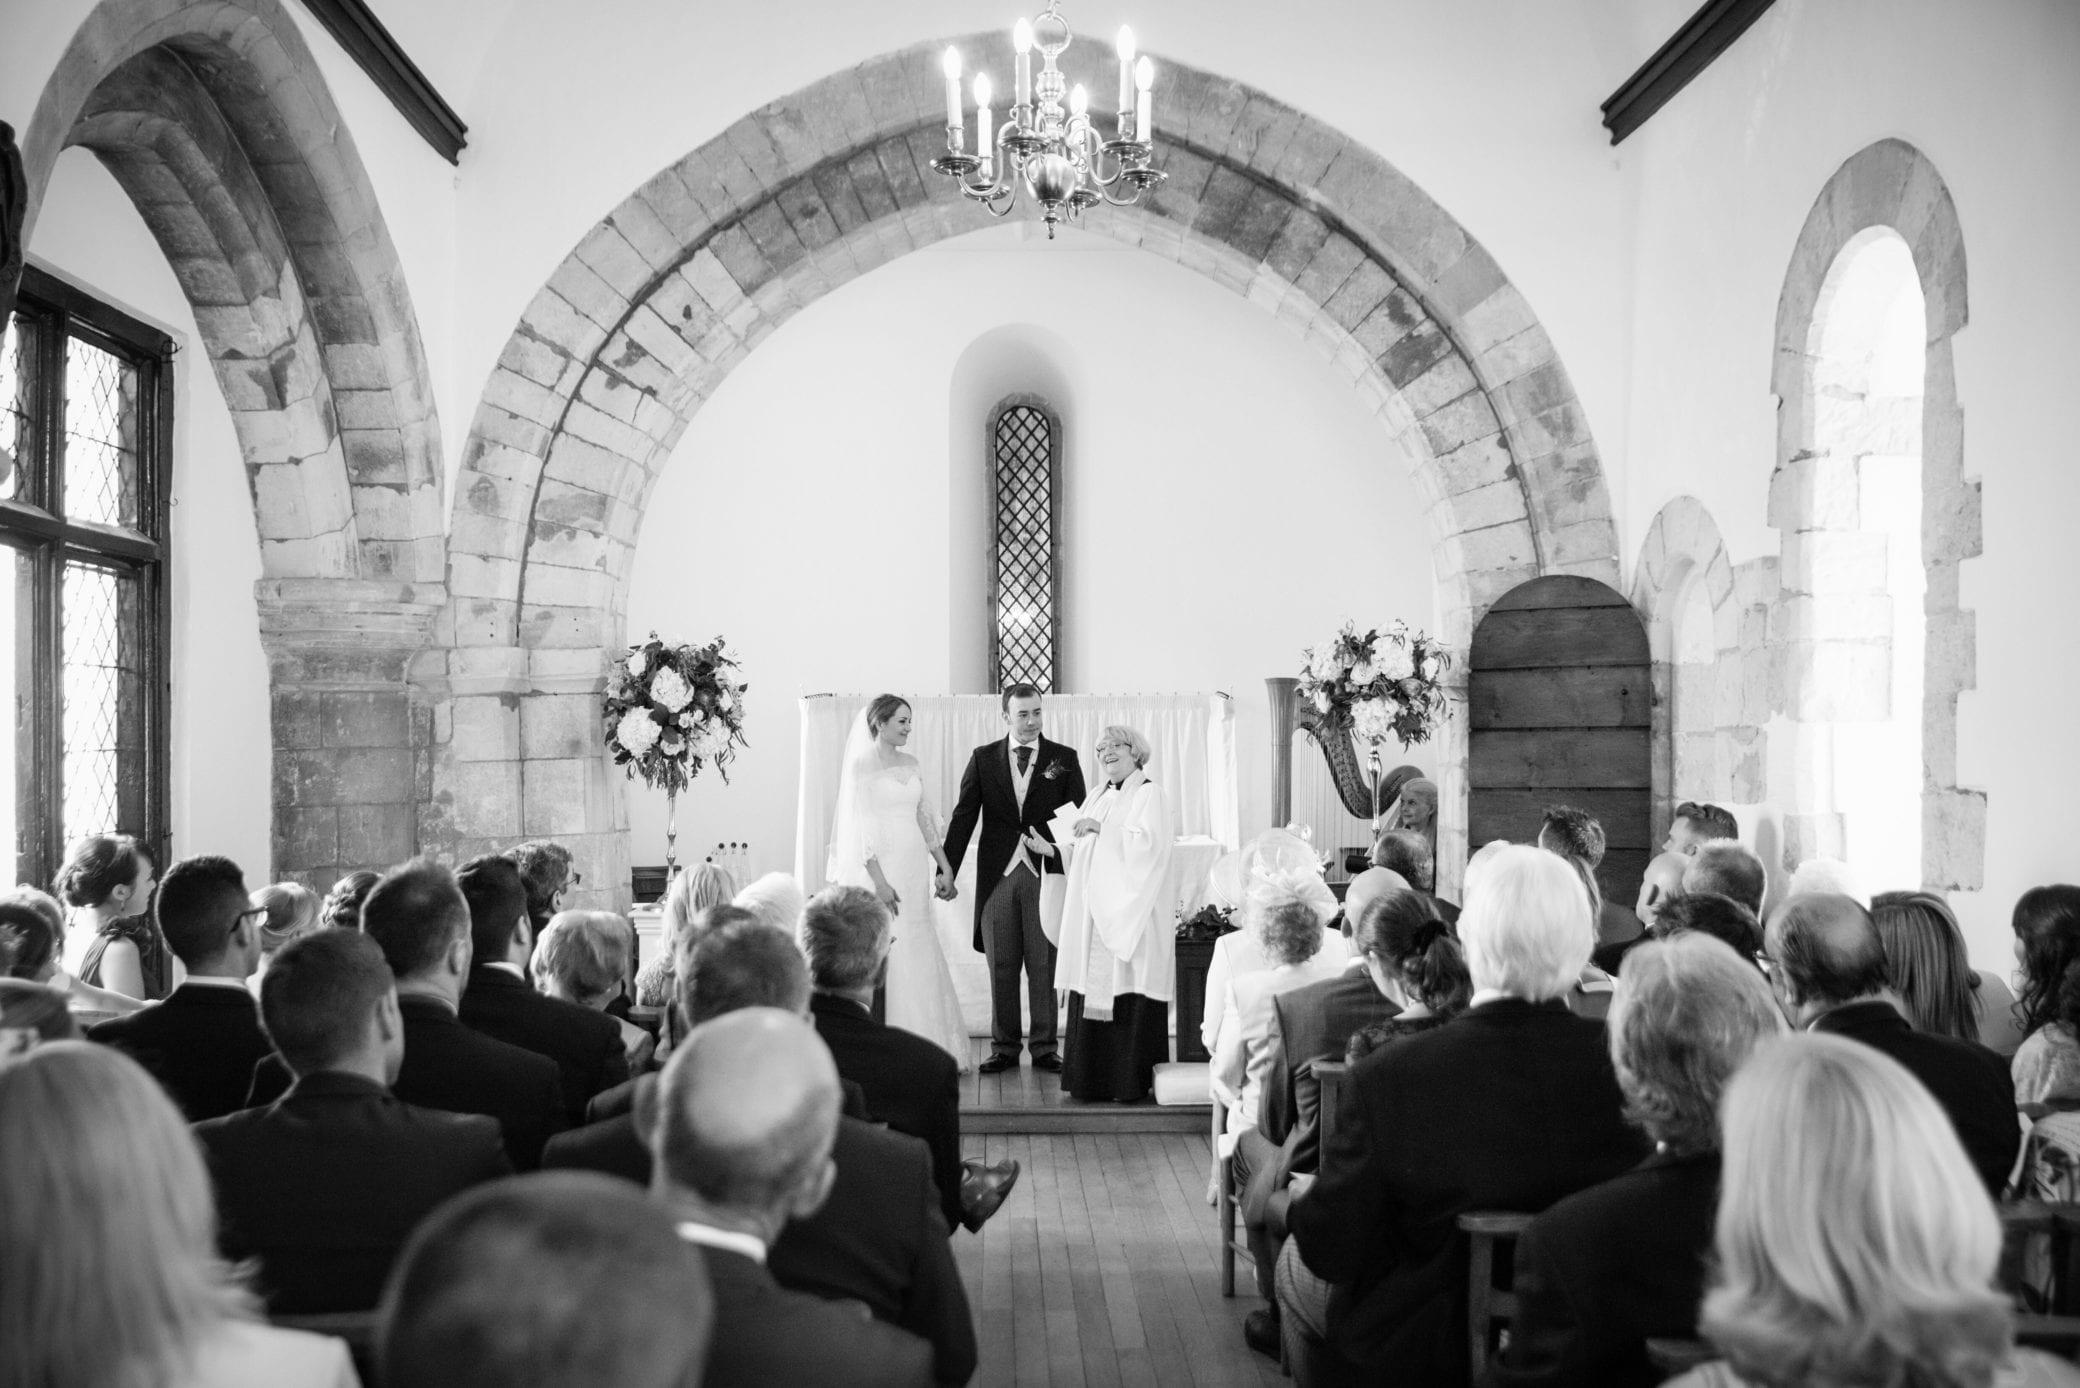 Religious wedding ceremony in Farnham